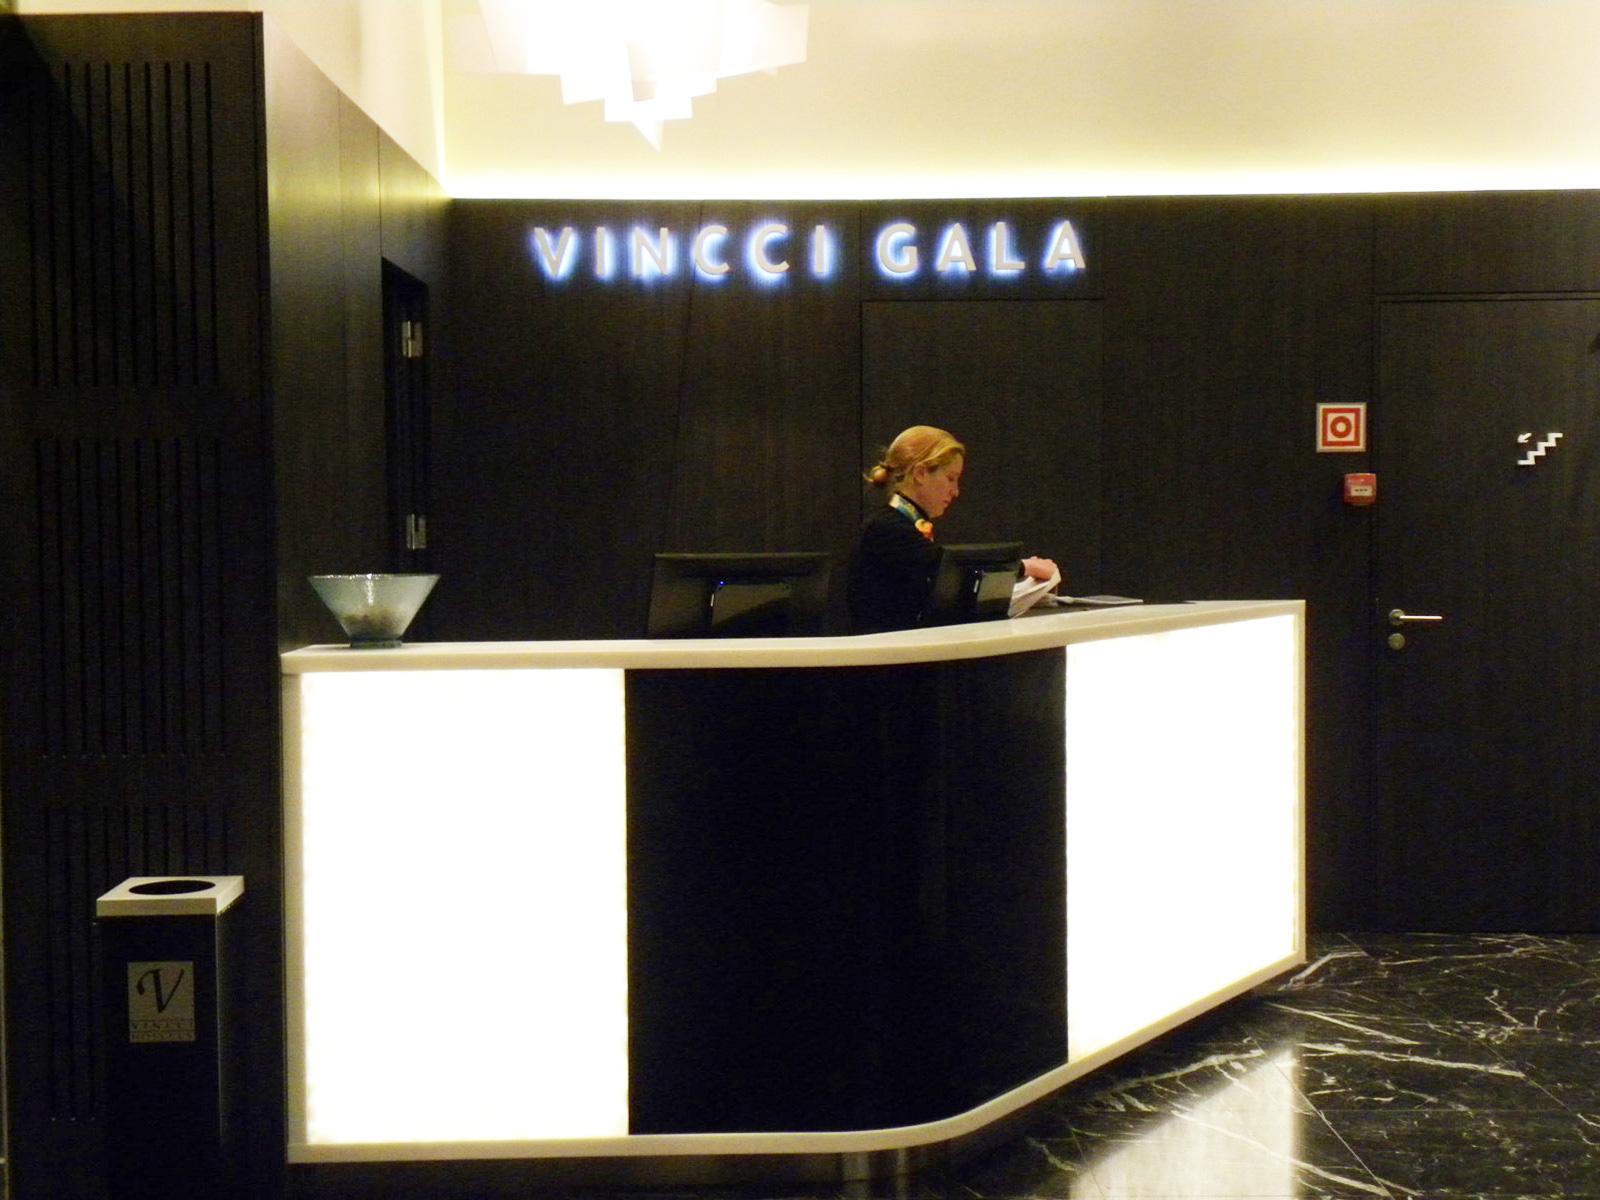 Reception - Vincci Gala 4*